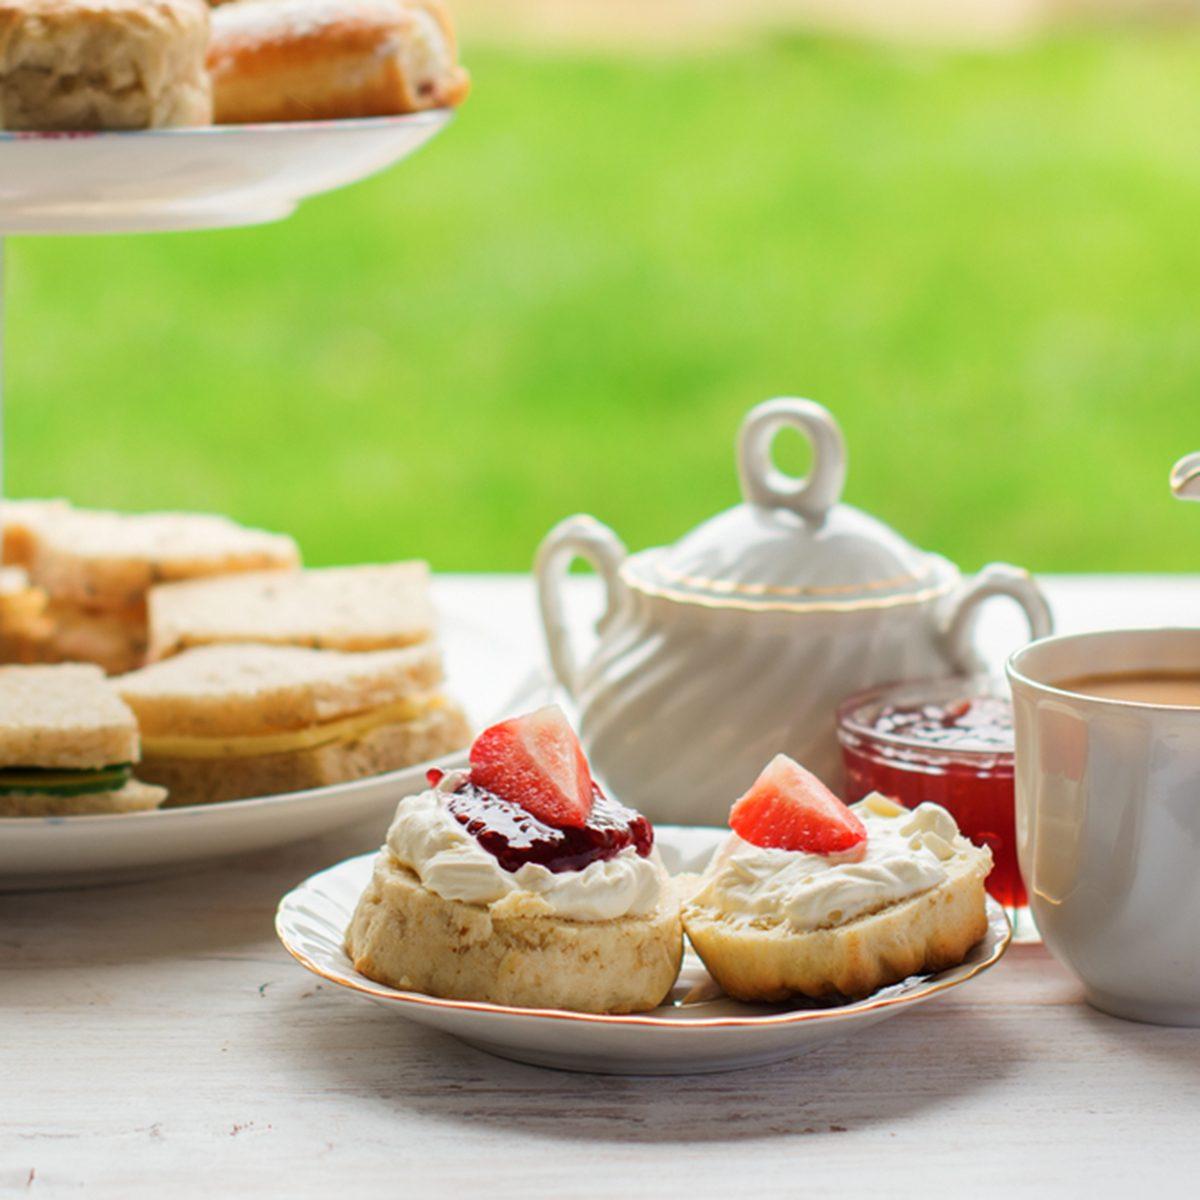 English Tea Party Ideas: 10 Tea Party Ideas Fit For A Queen